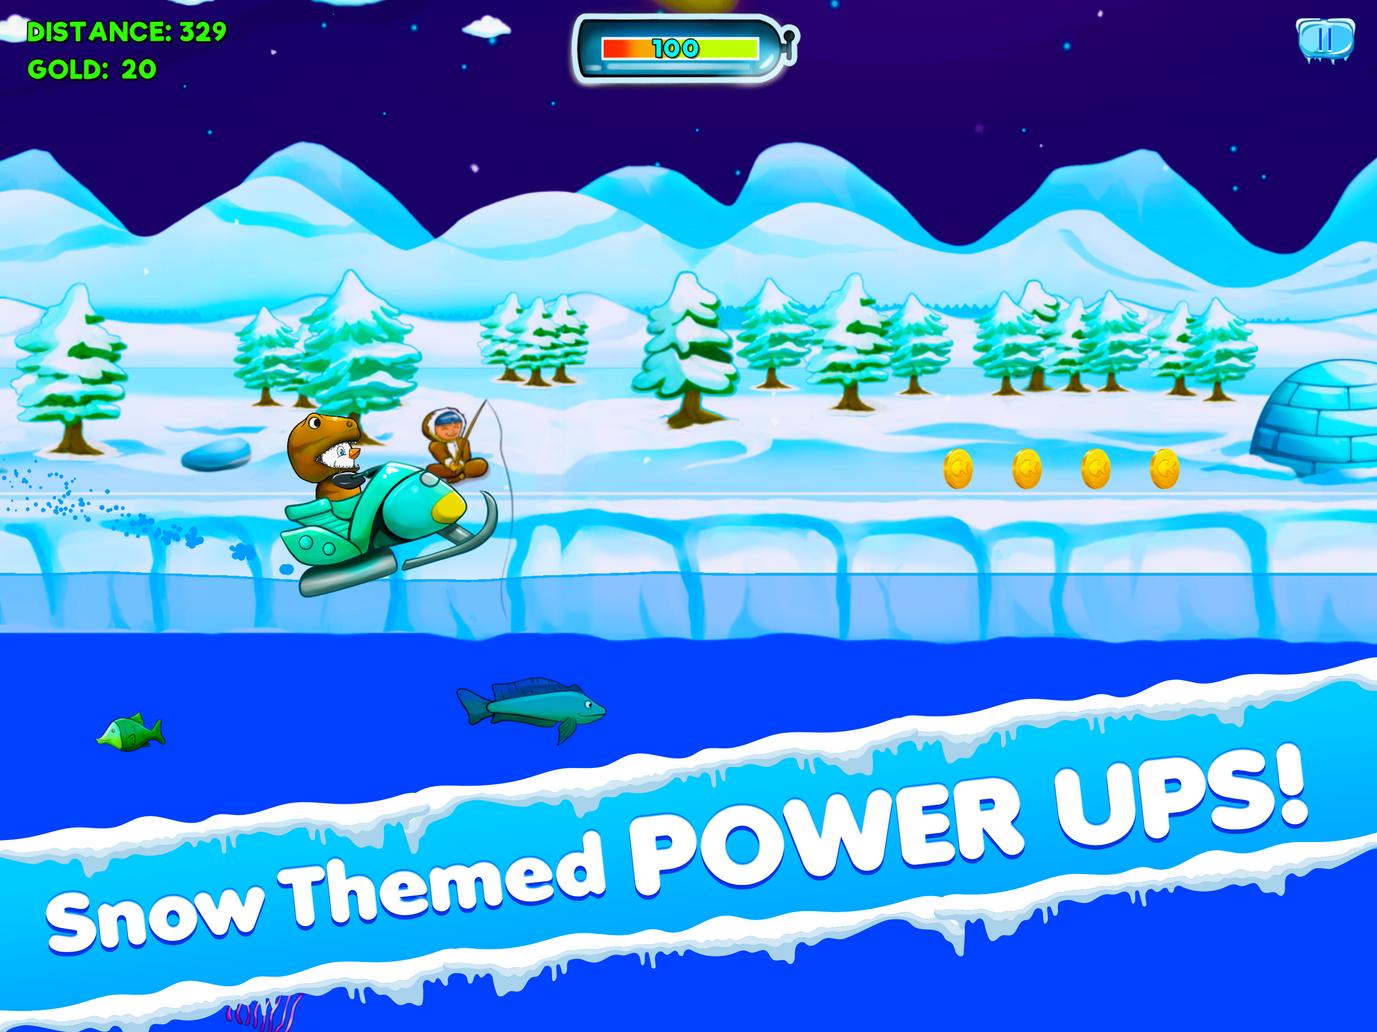 Snow themed power ups